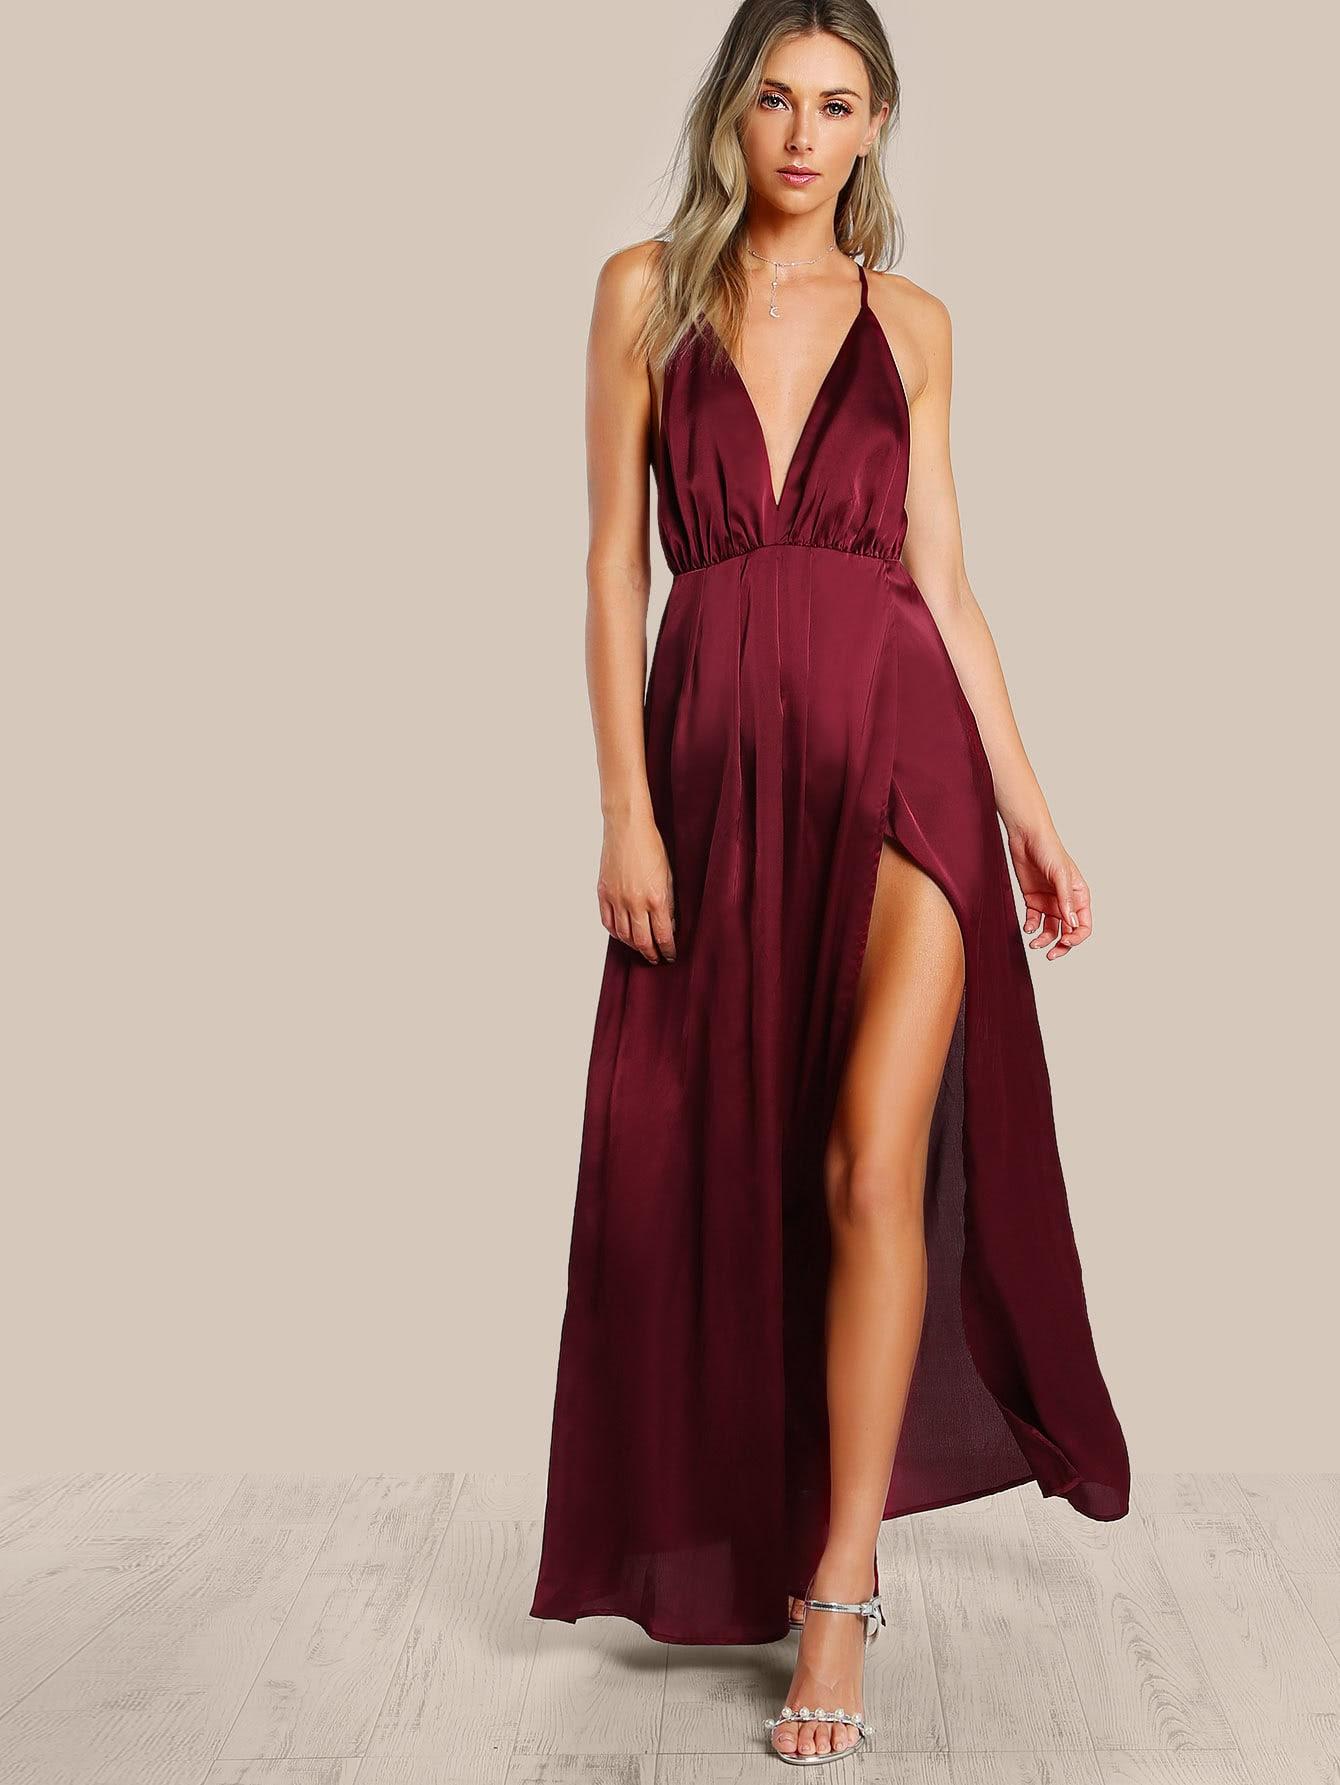 Spaghetti Strap Backless Plain Maxi Dress